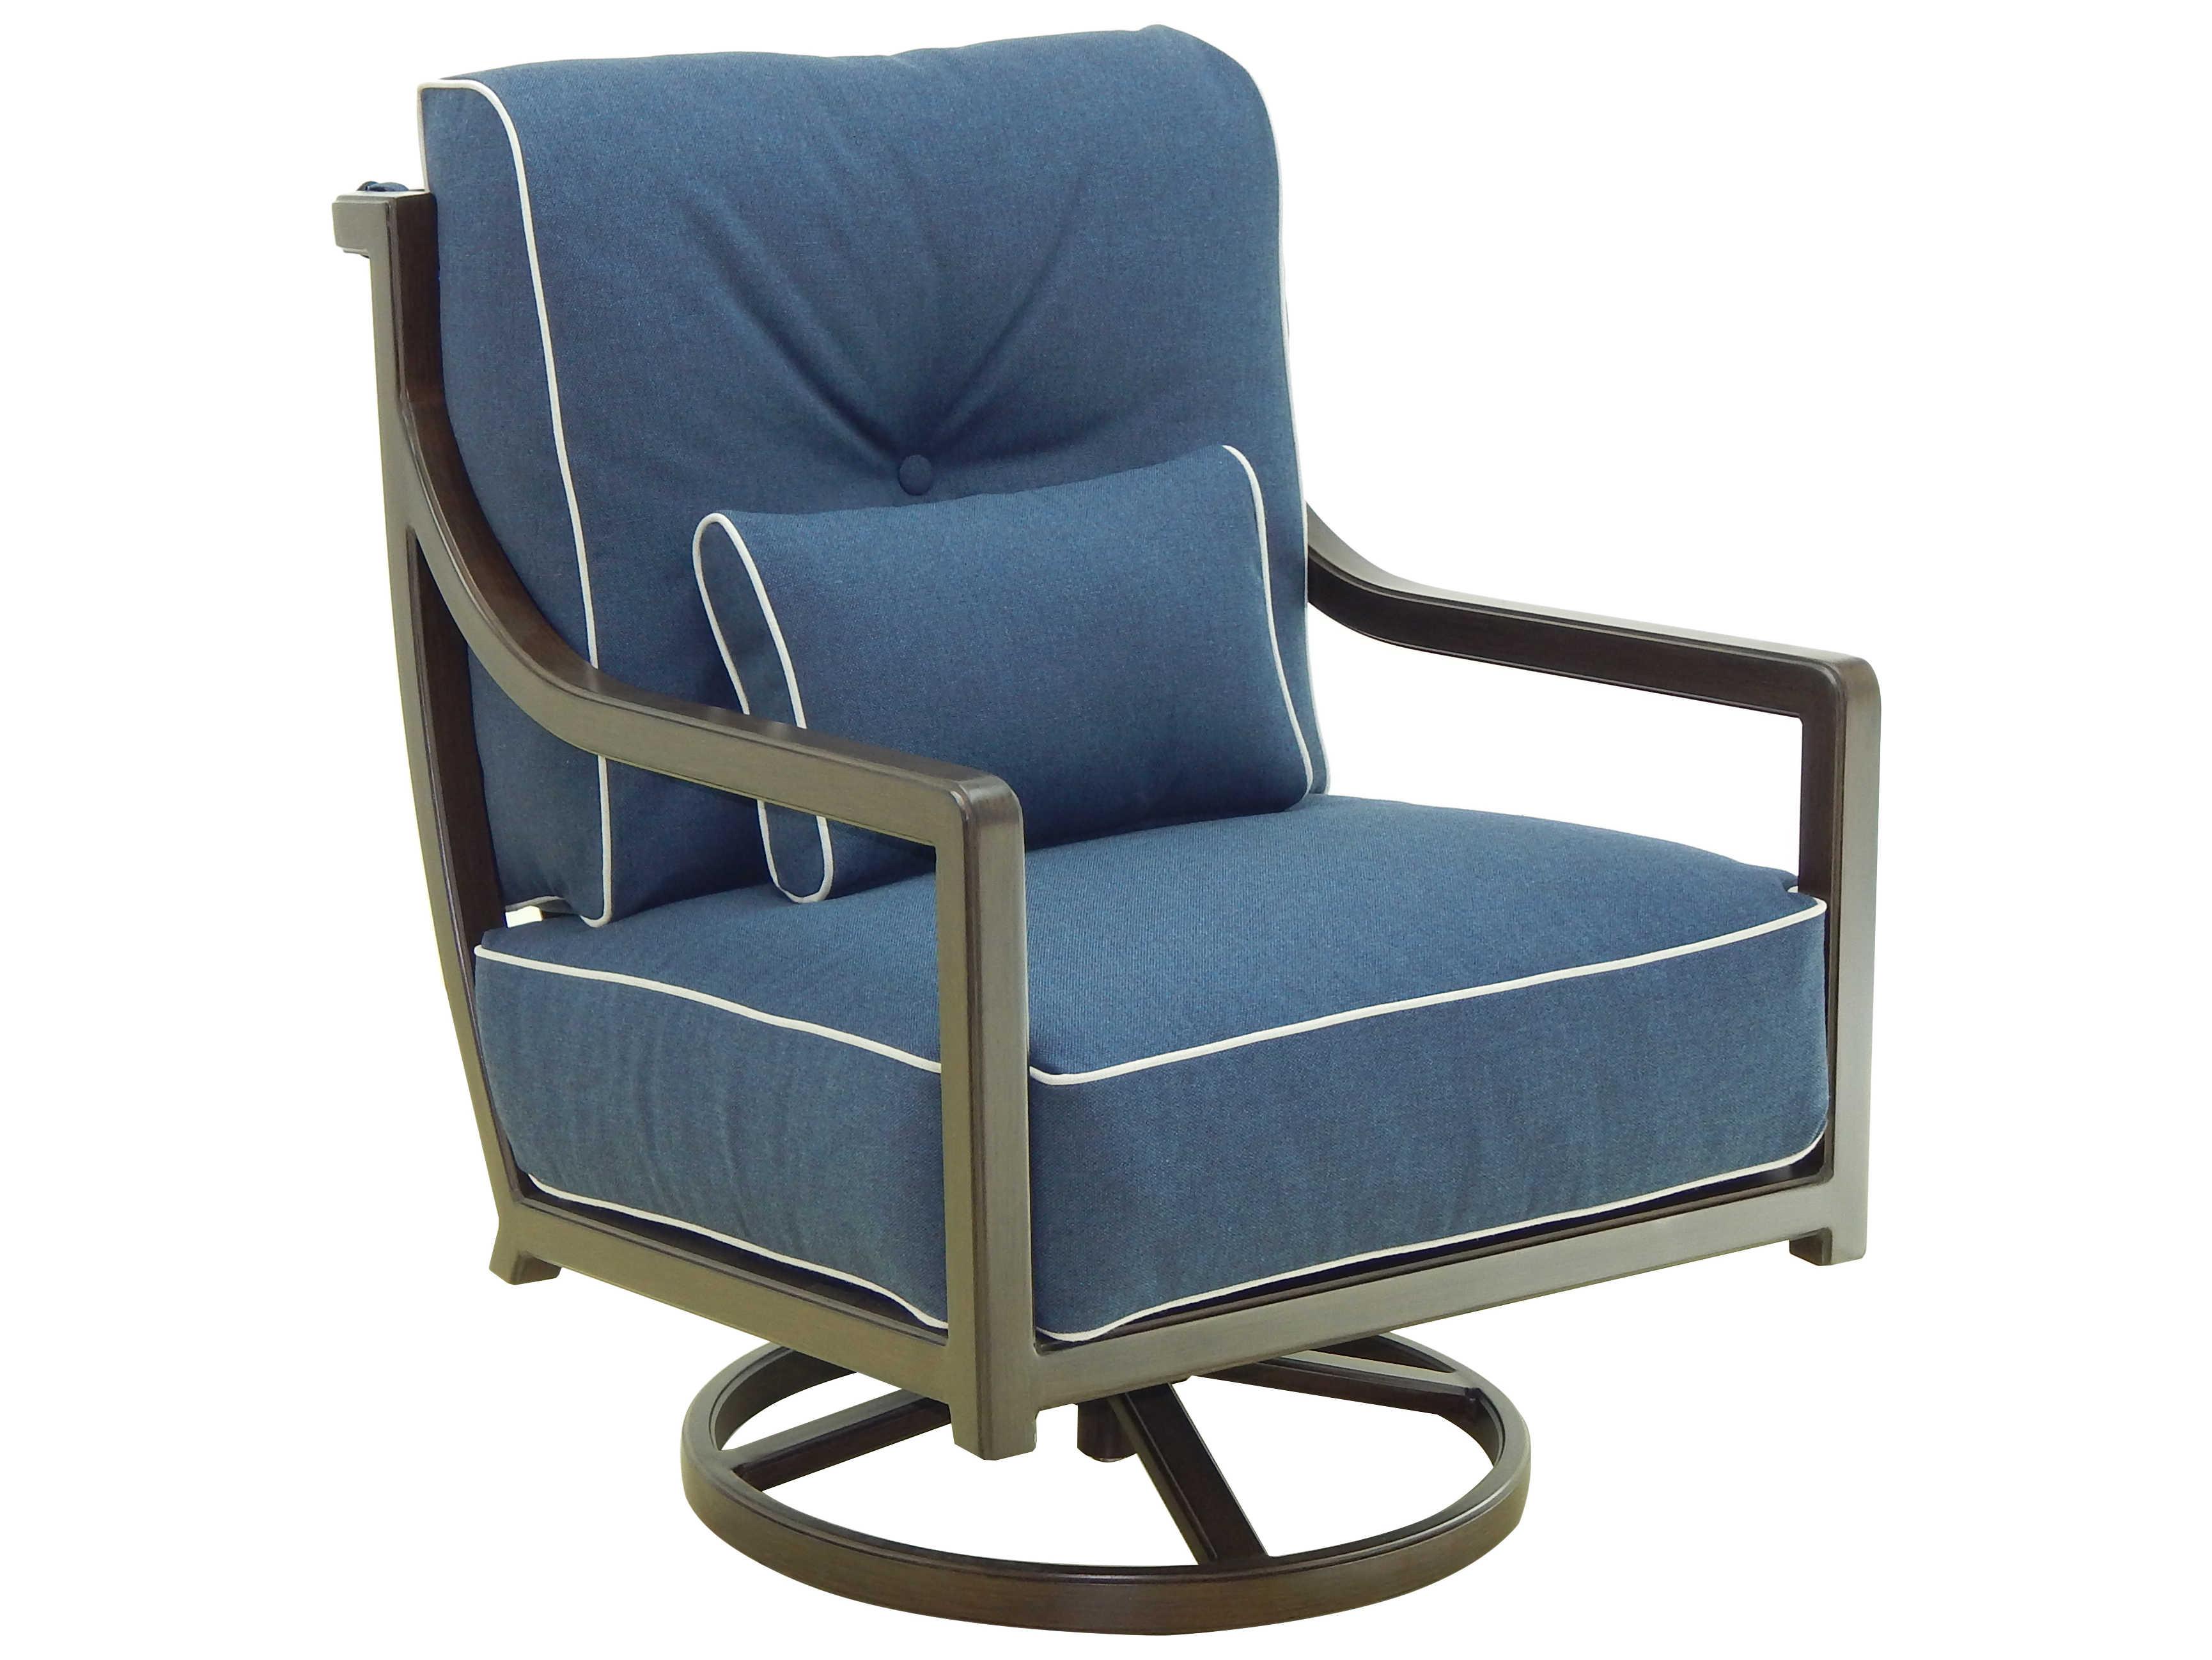 Castelle Legend Deep Seating Aluminum Cushion High Back